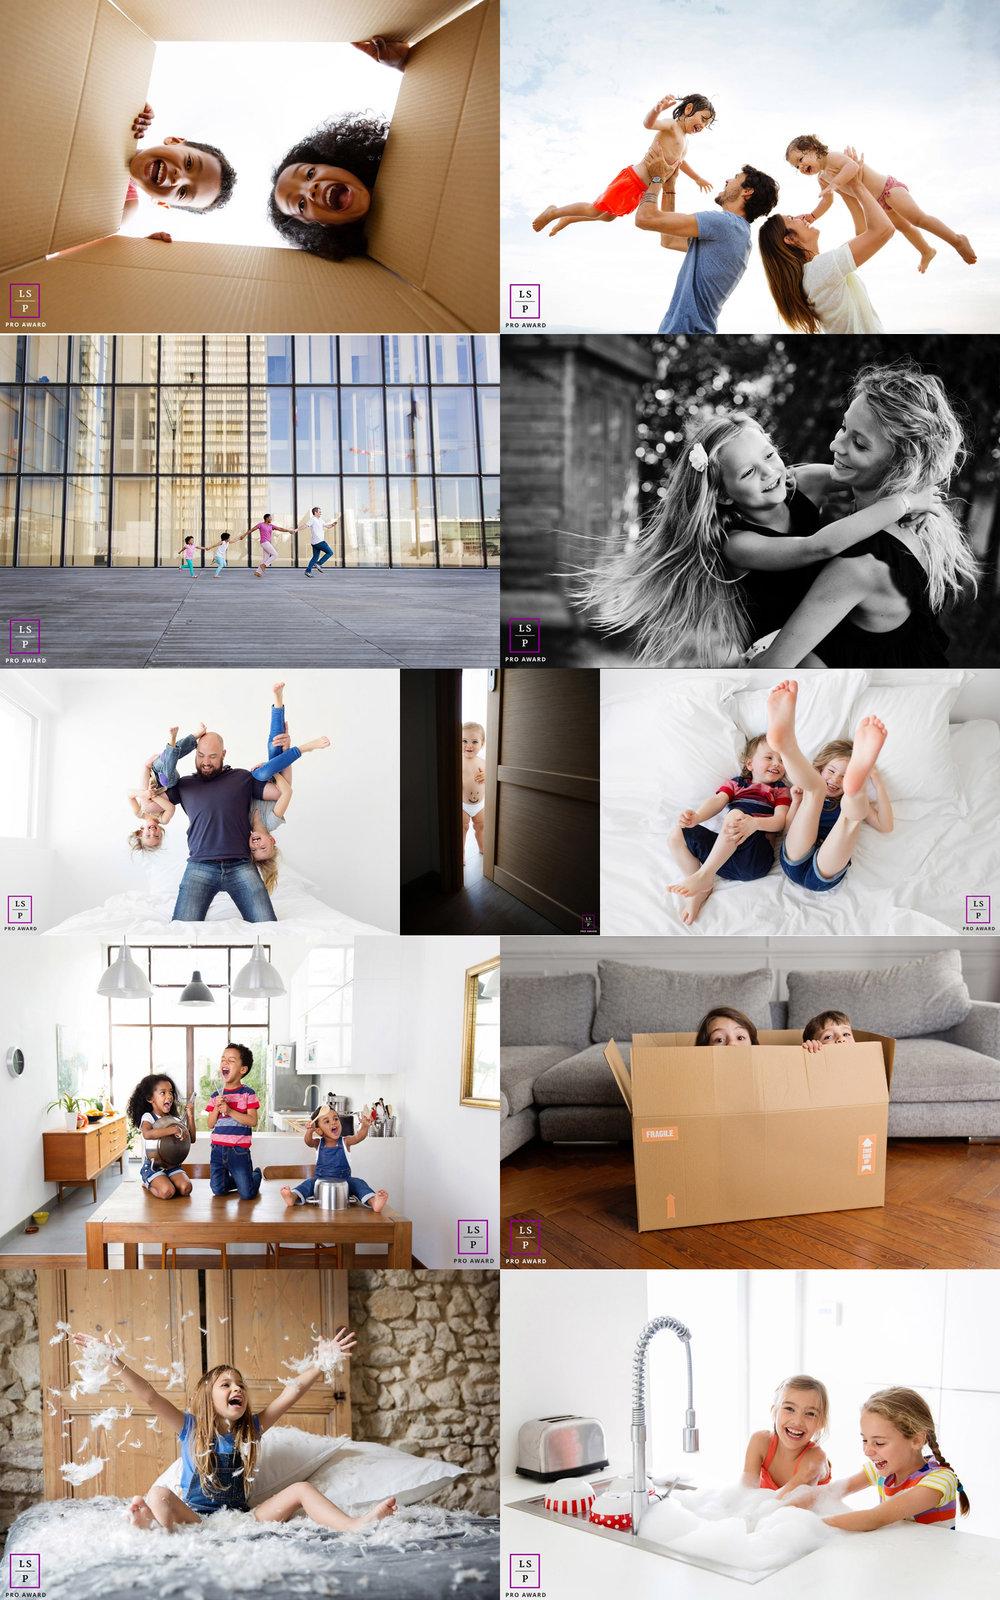 LIfestyle-Photography-Awards-Lisa-Tichane-France.jpg